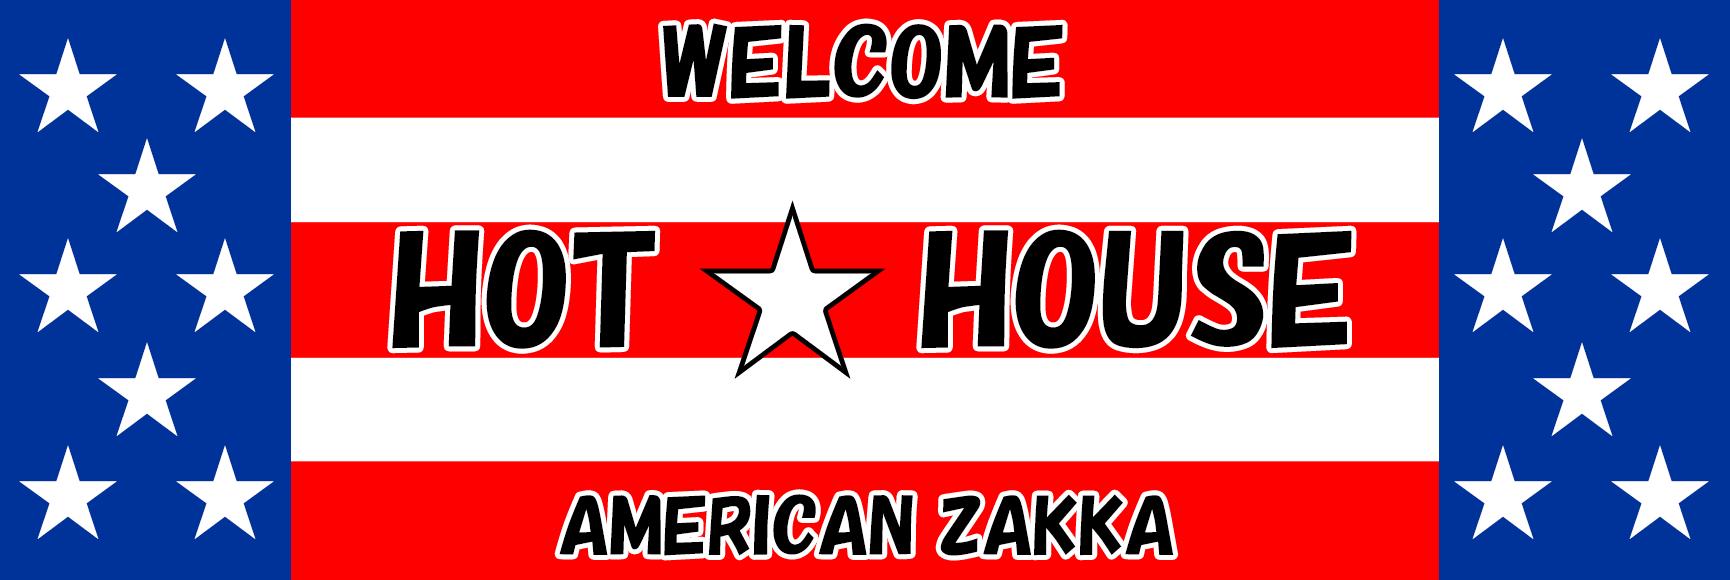 hotohouse-logo